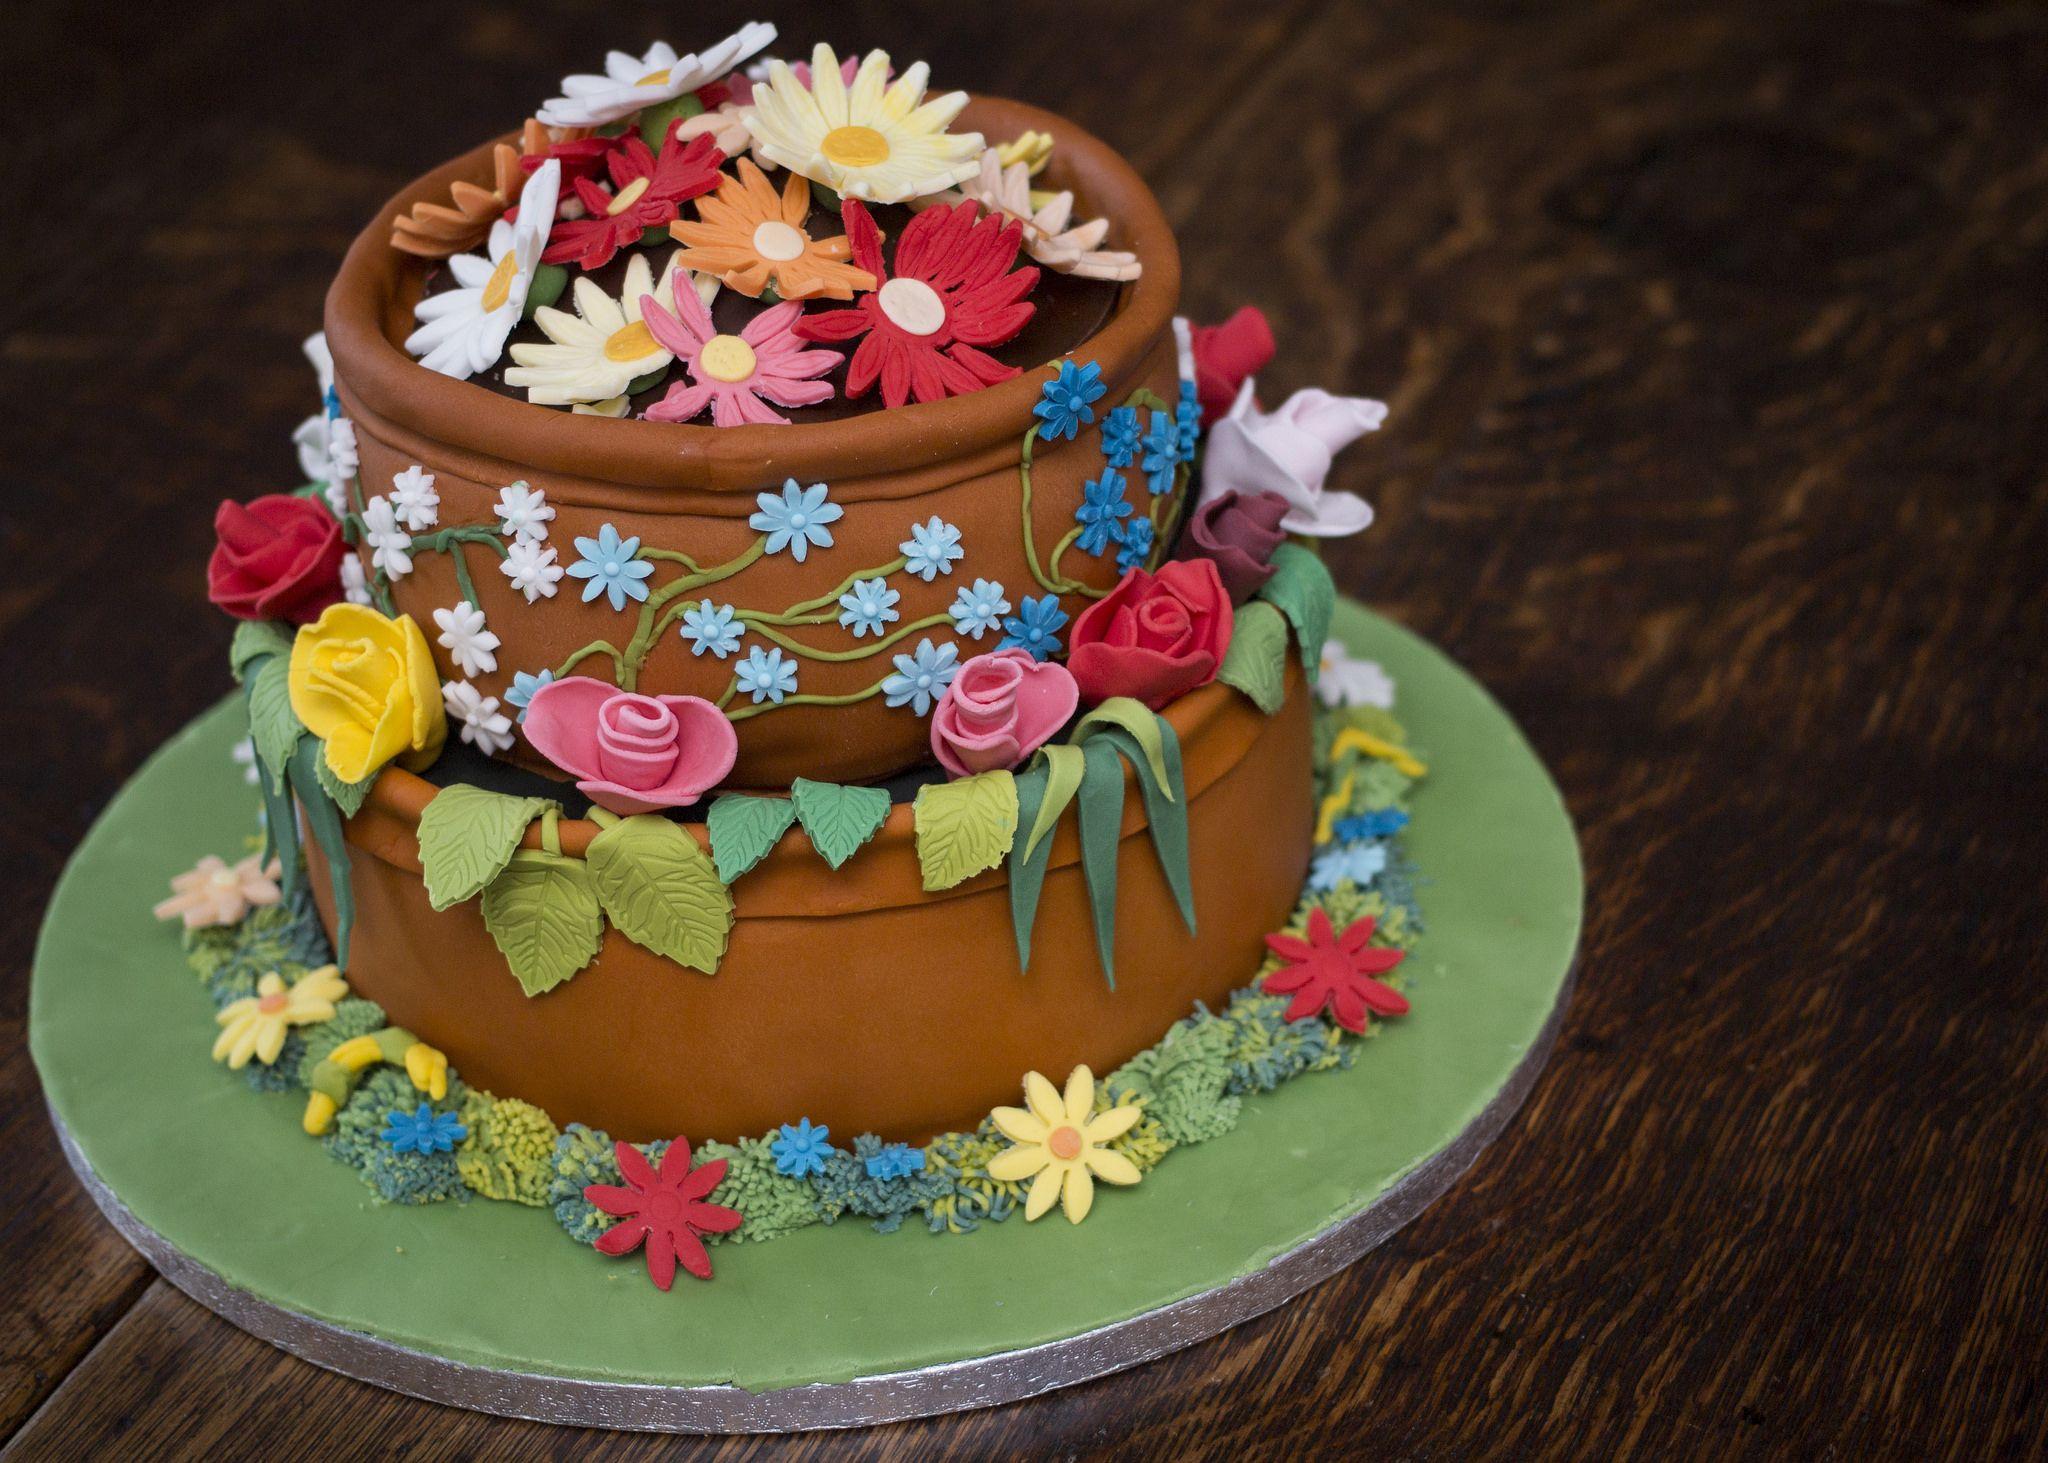 70 Birthday Cake Geoffs Birthday Pinterest 70th Birthday Cake